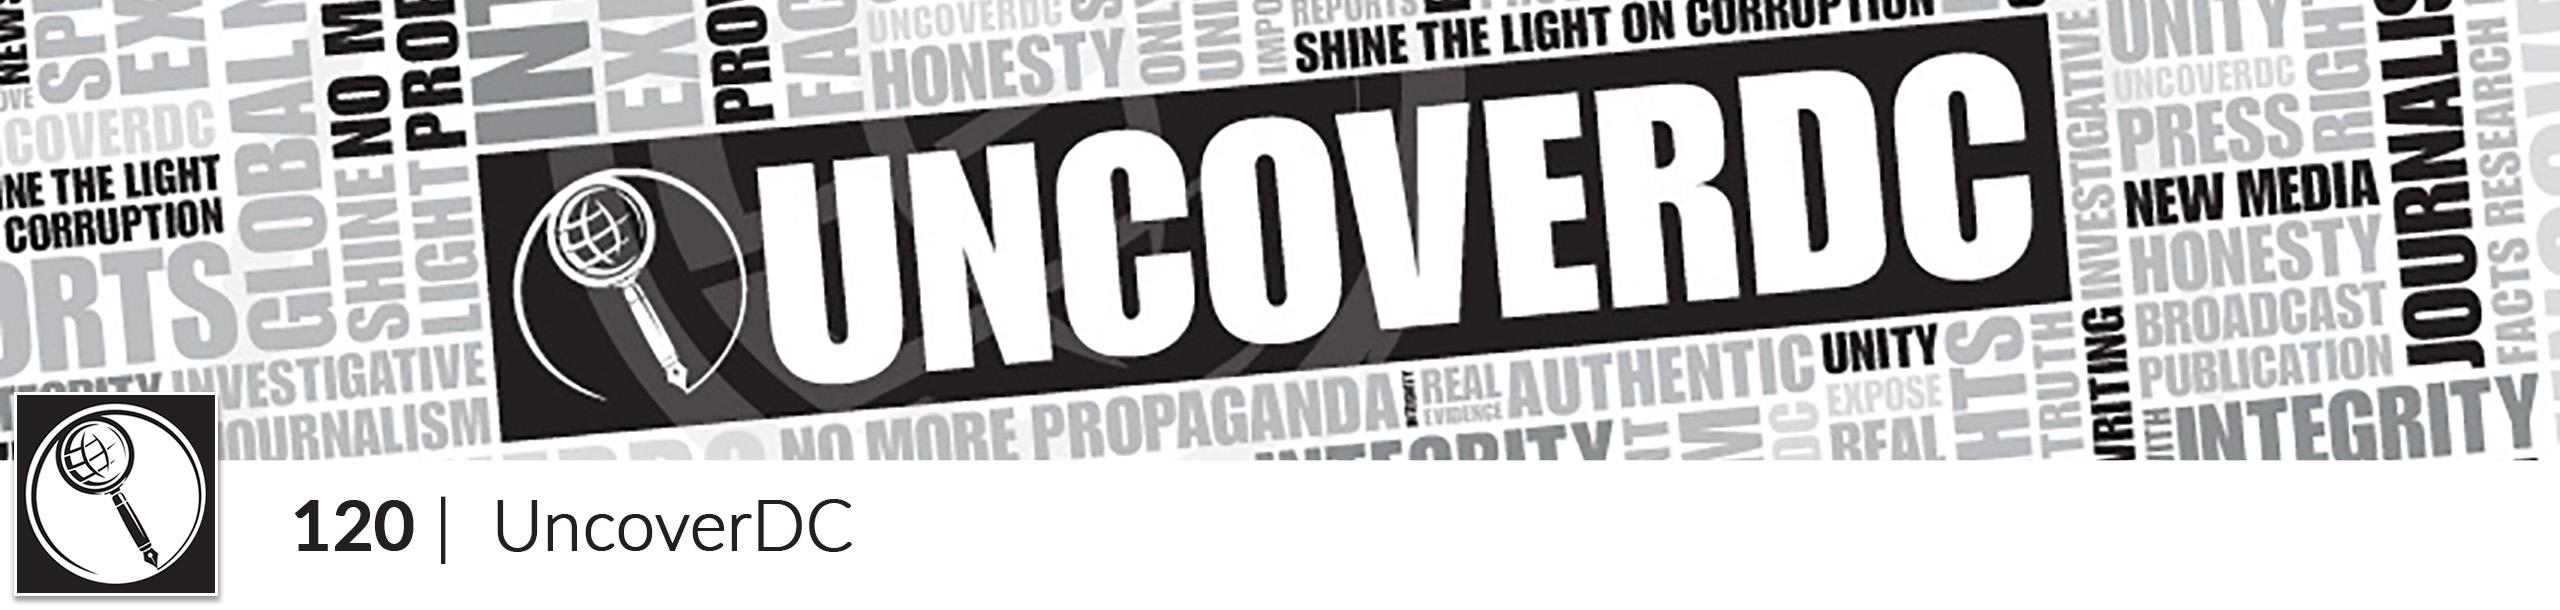 undercoverdc-header-2